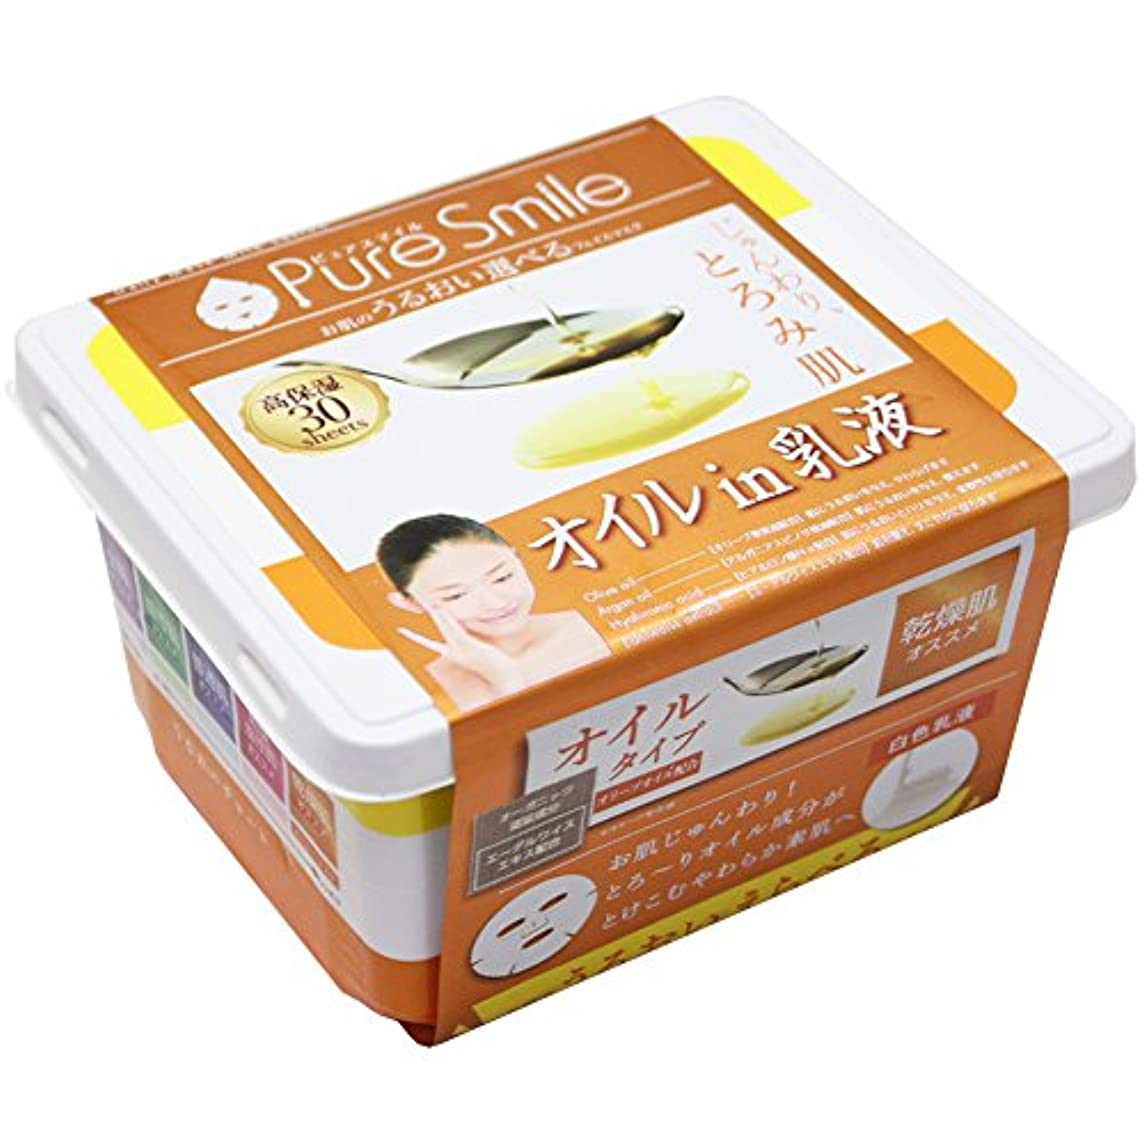 PureSmile(ピュアスマイル) フェイスパック エッセンスマスク 30枚セット オイルin乳液?3S05